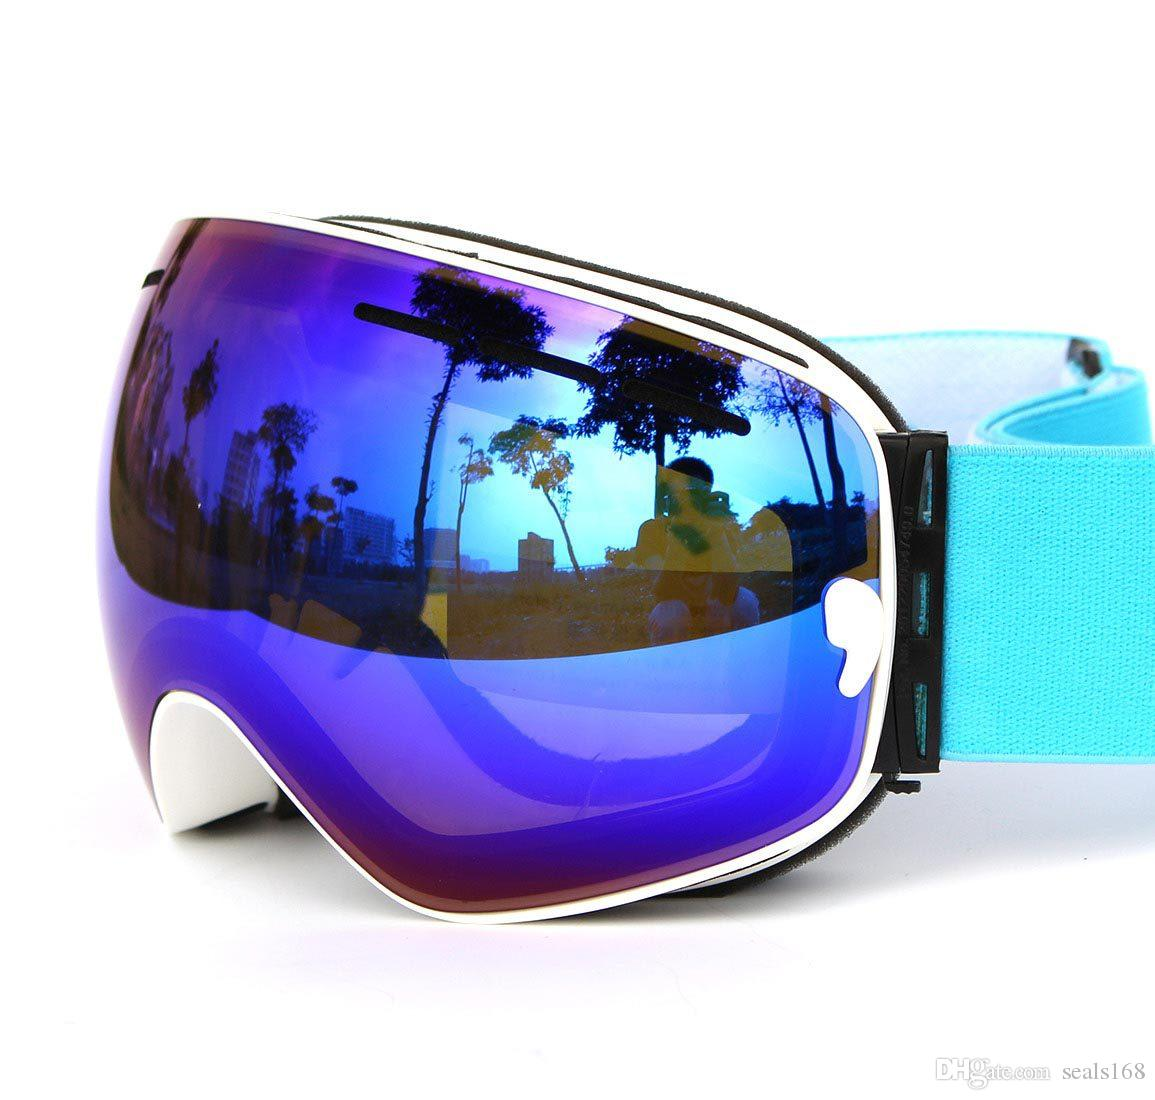 ladies ski goggles 2kbk  ladies ski goggles